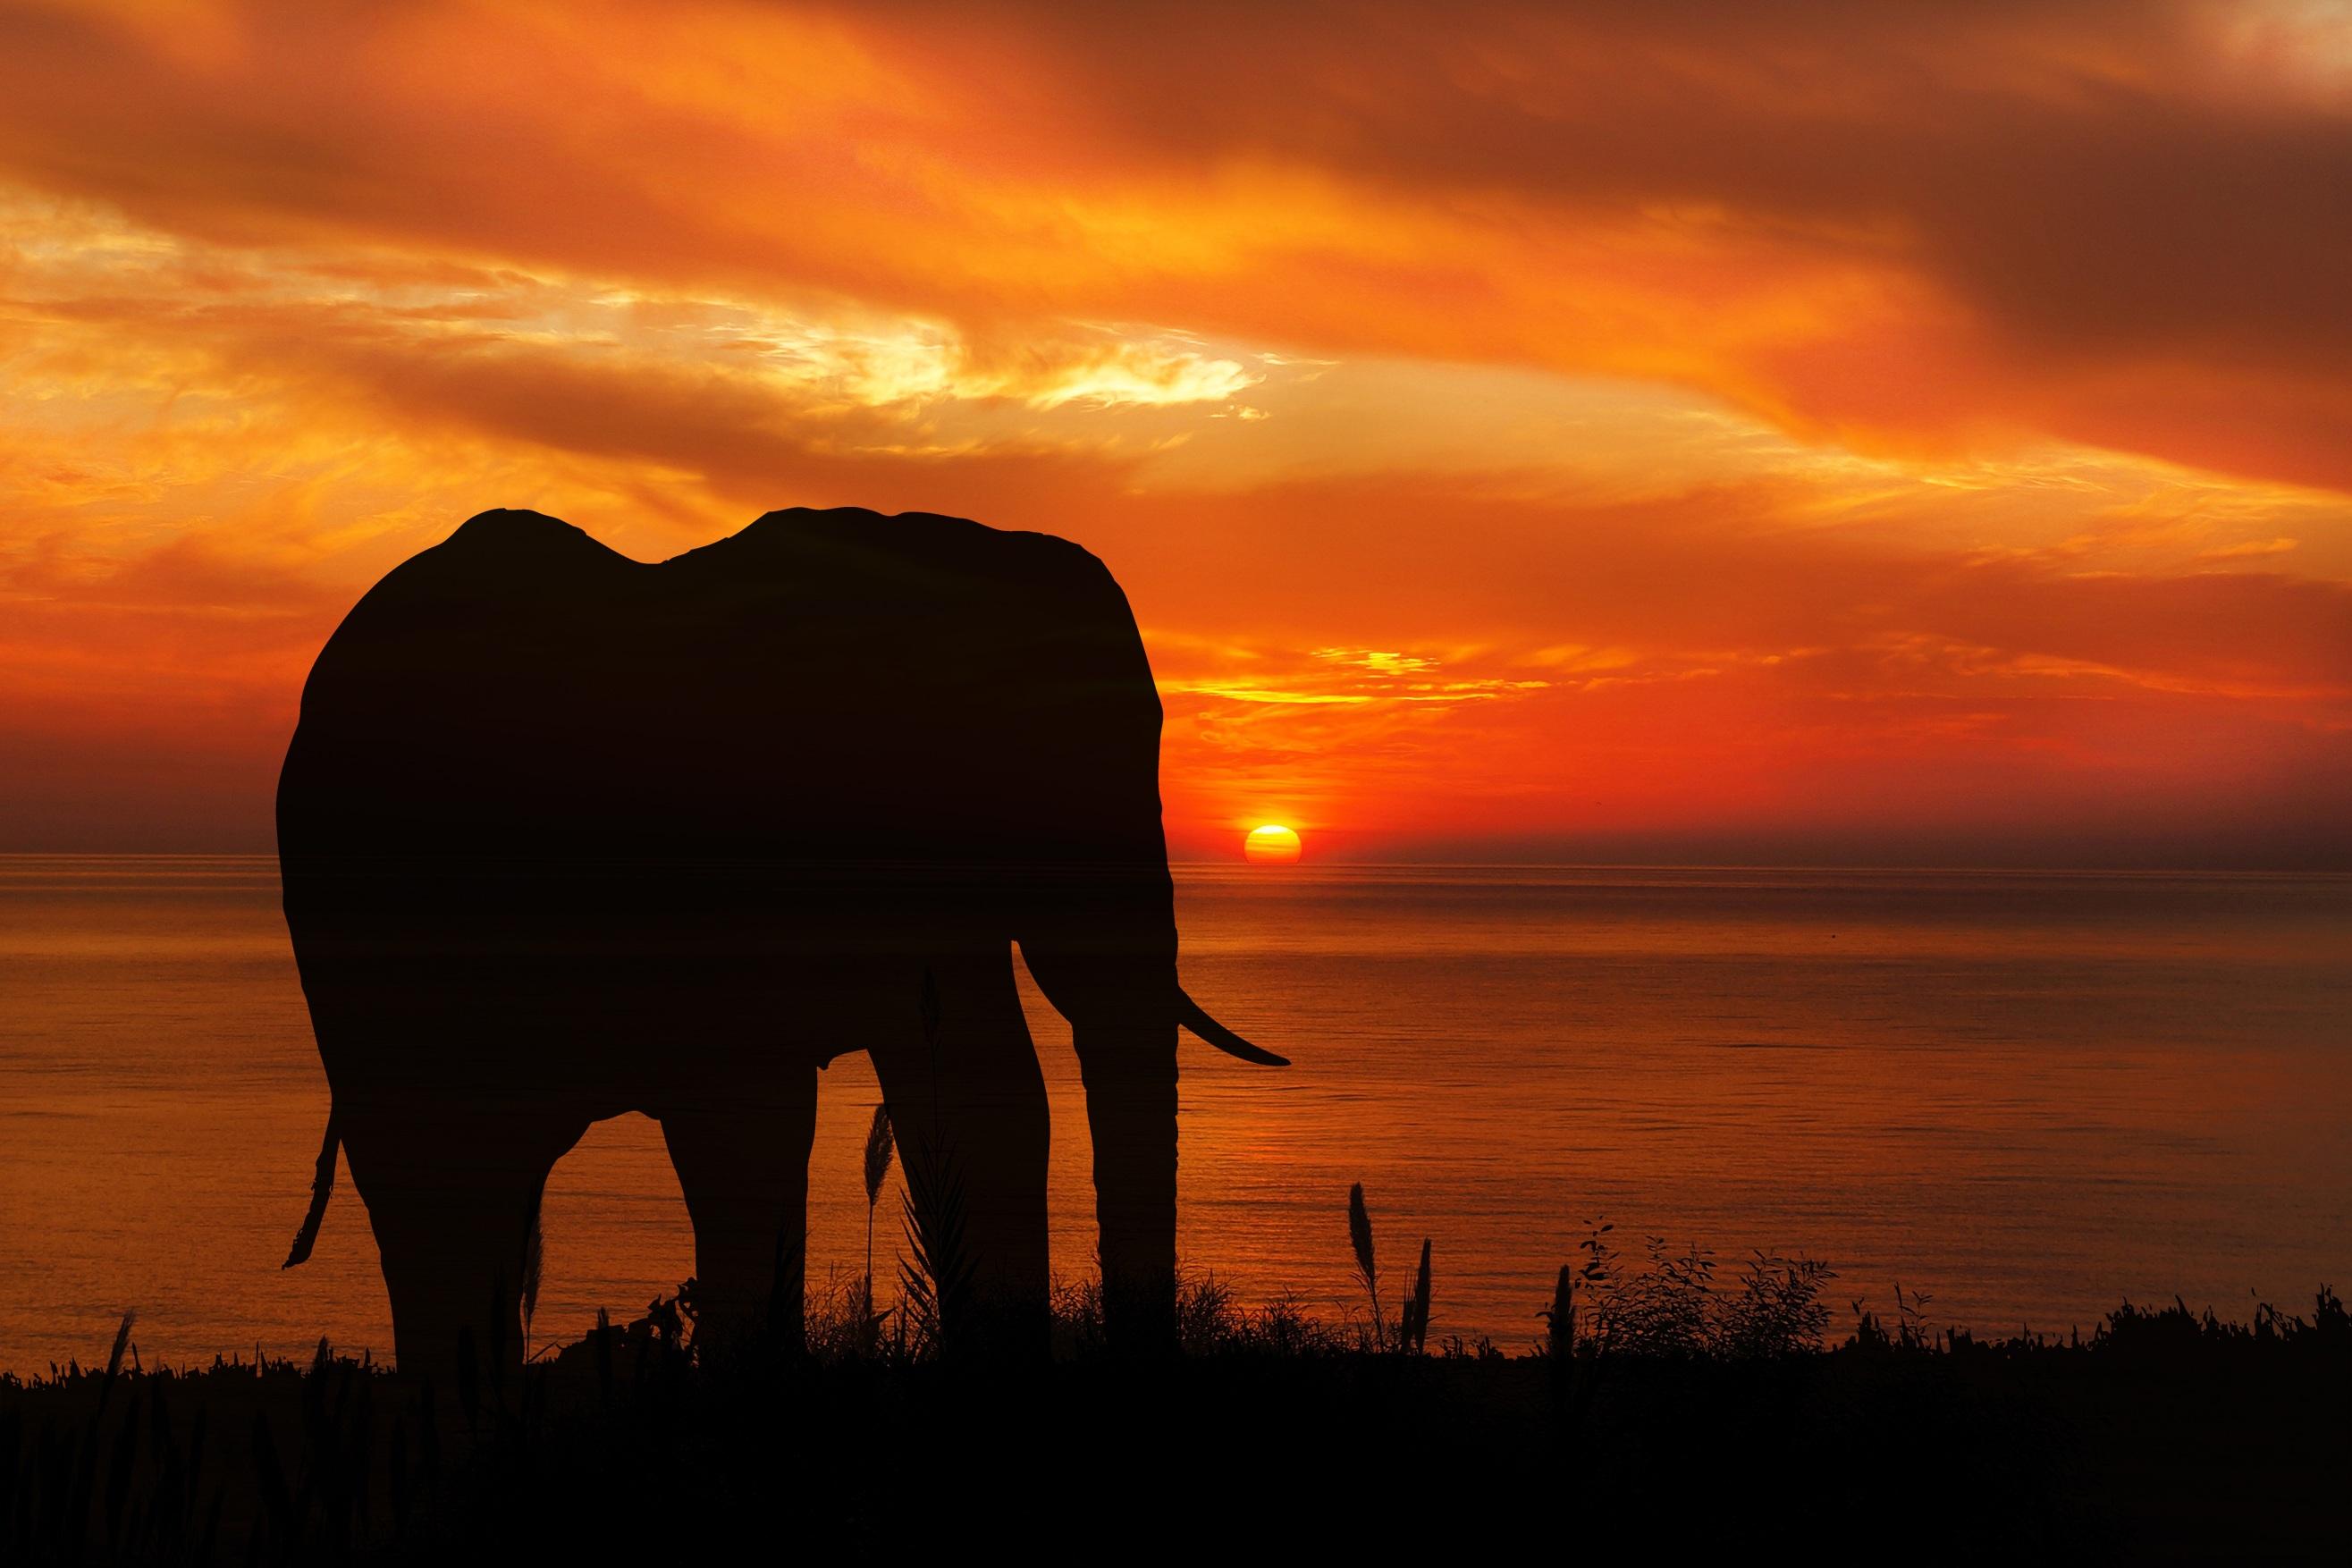 Elephant Silhouette Sunset 2631x1754